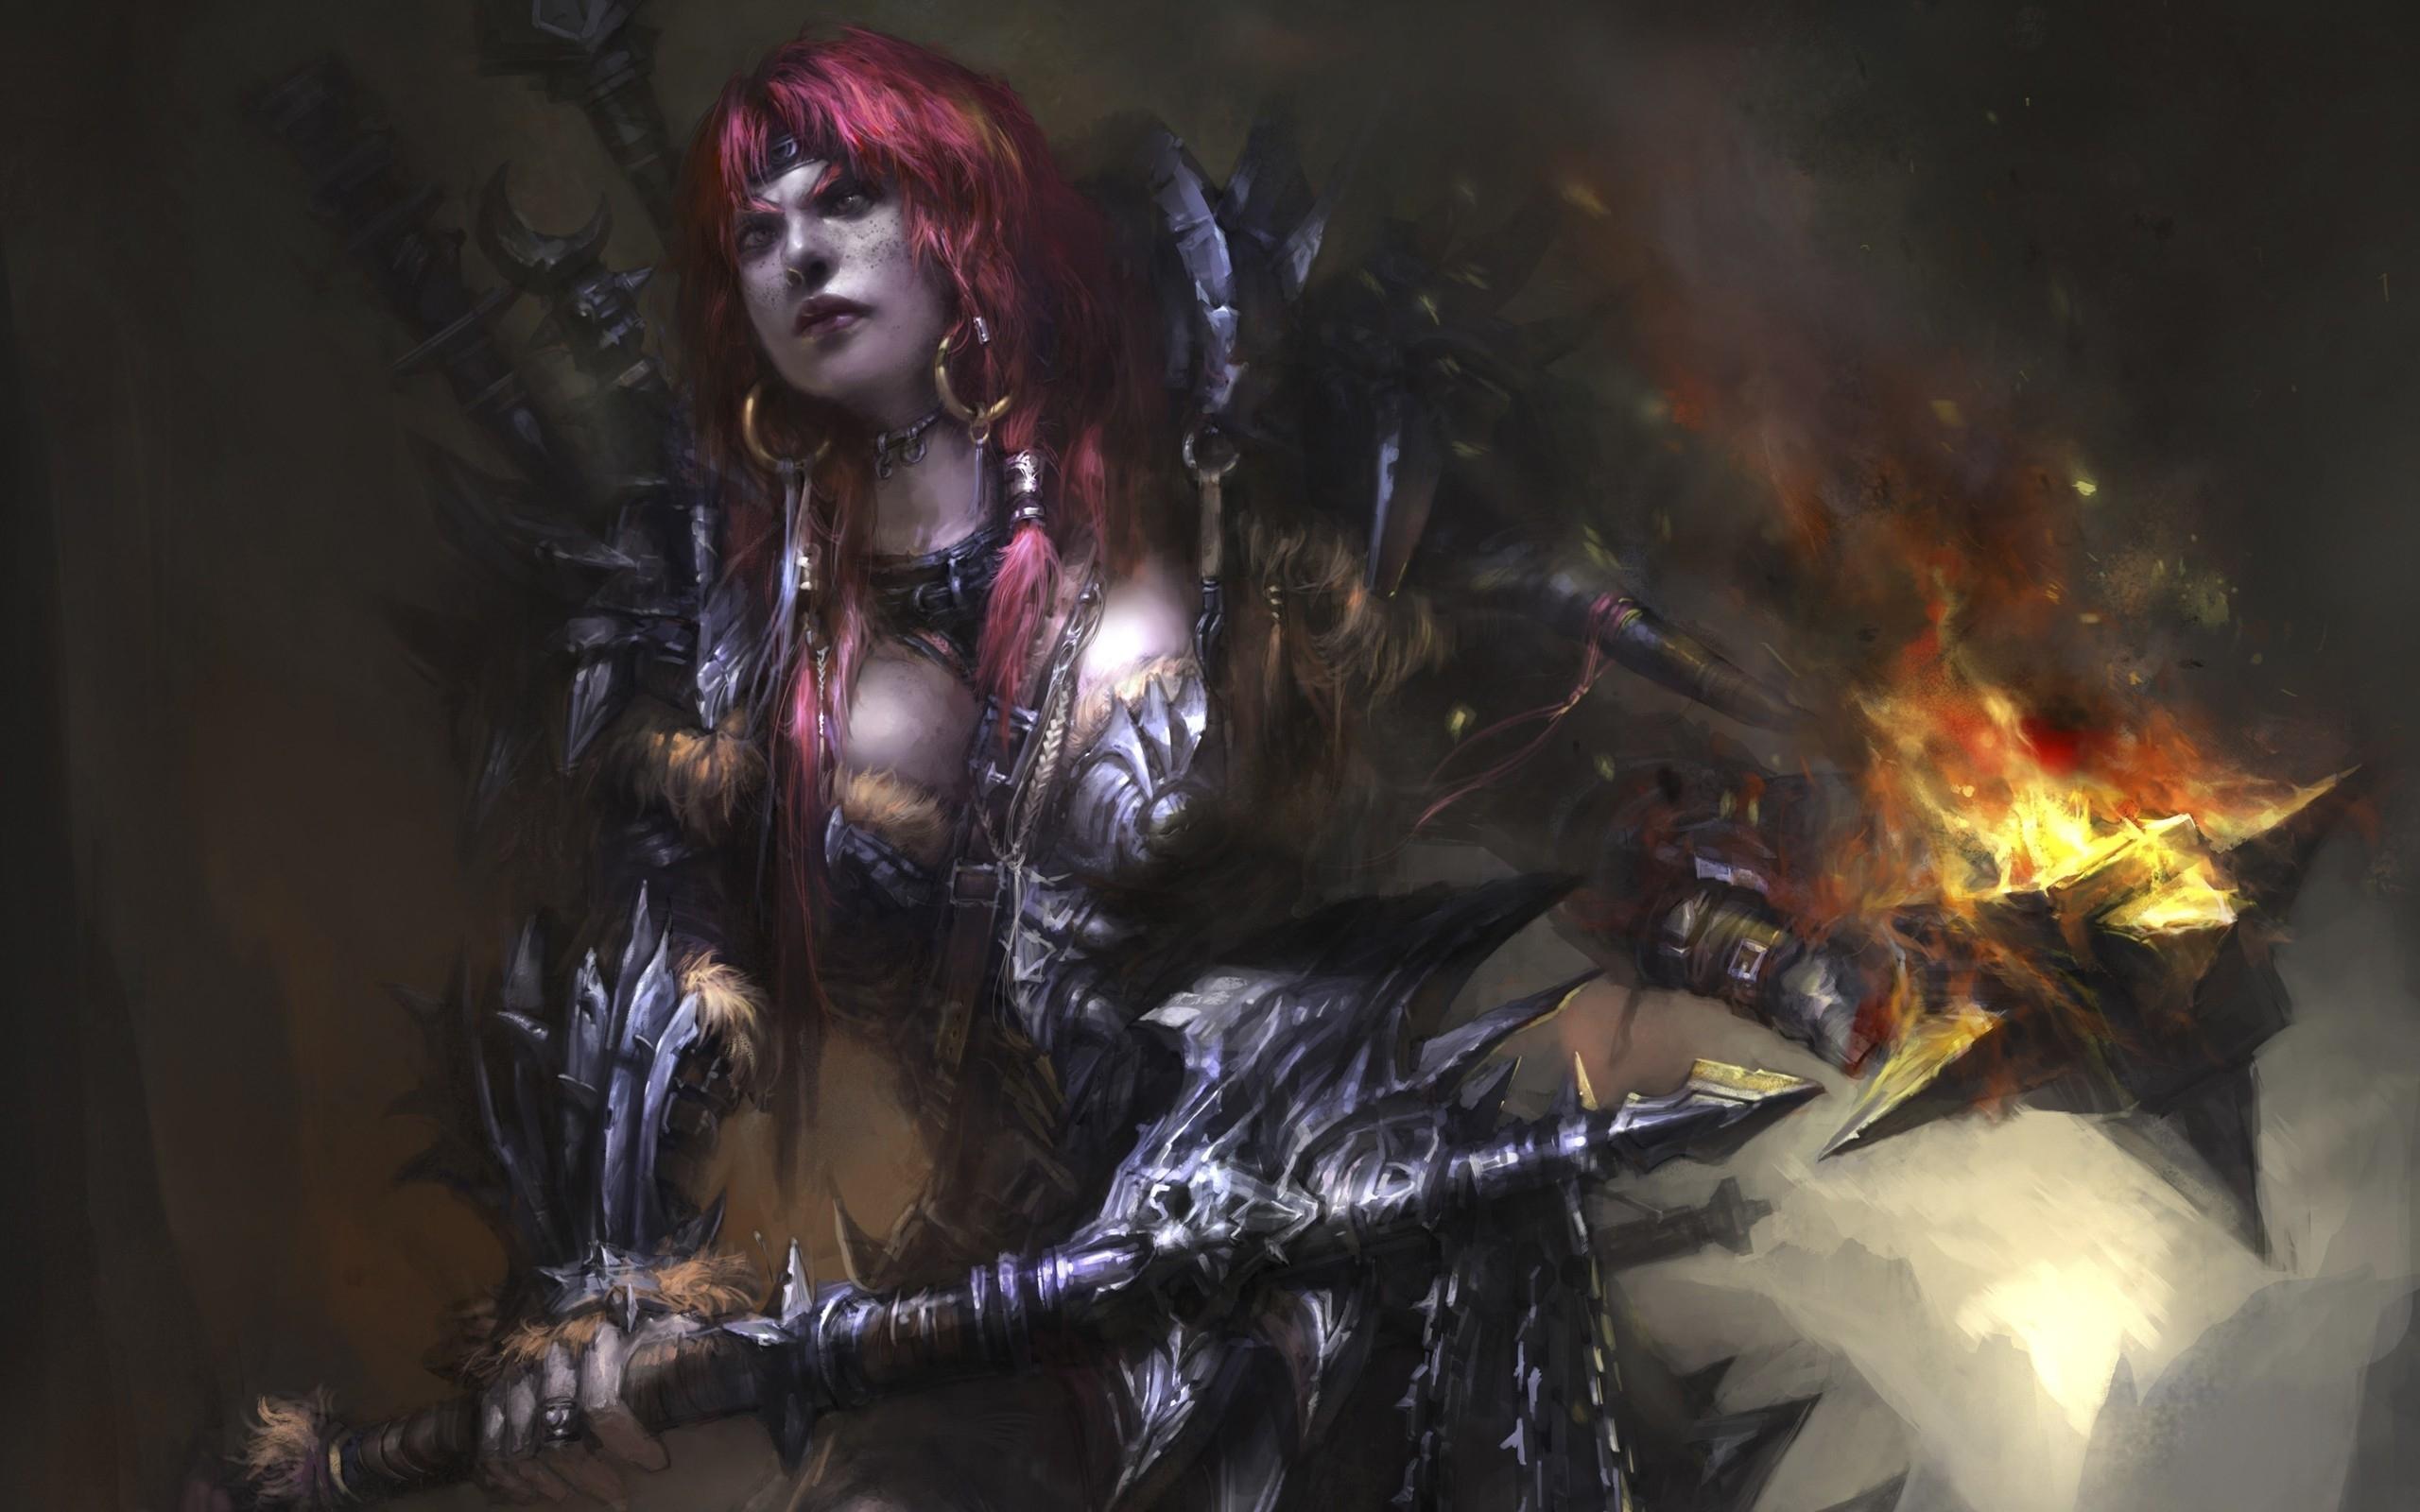 games redheads fantasy art armor barbarian artwork HD Wallpapers 2560x1600